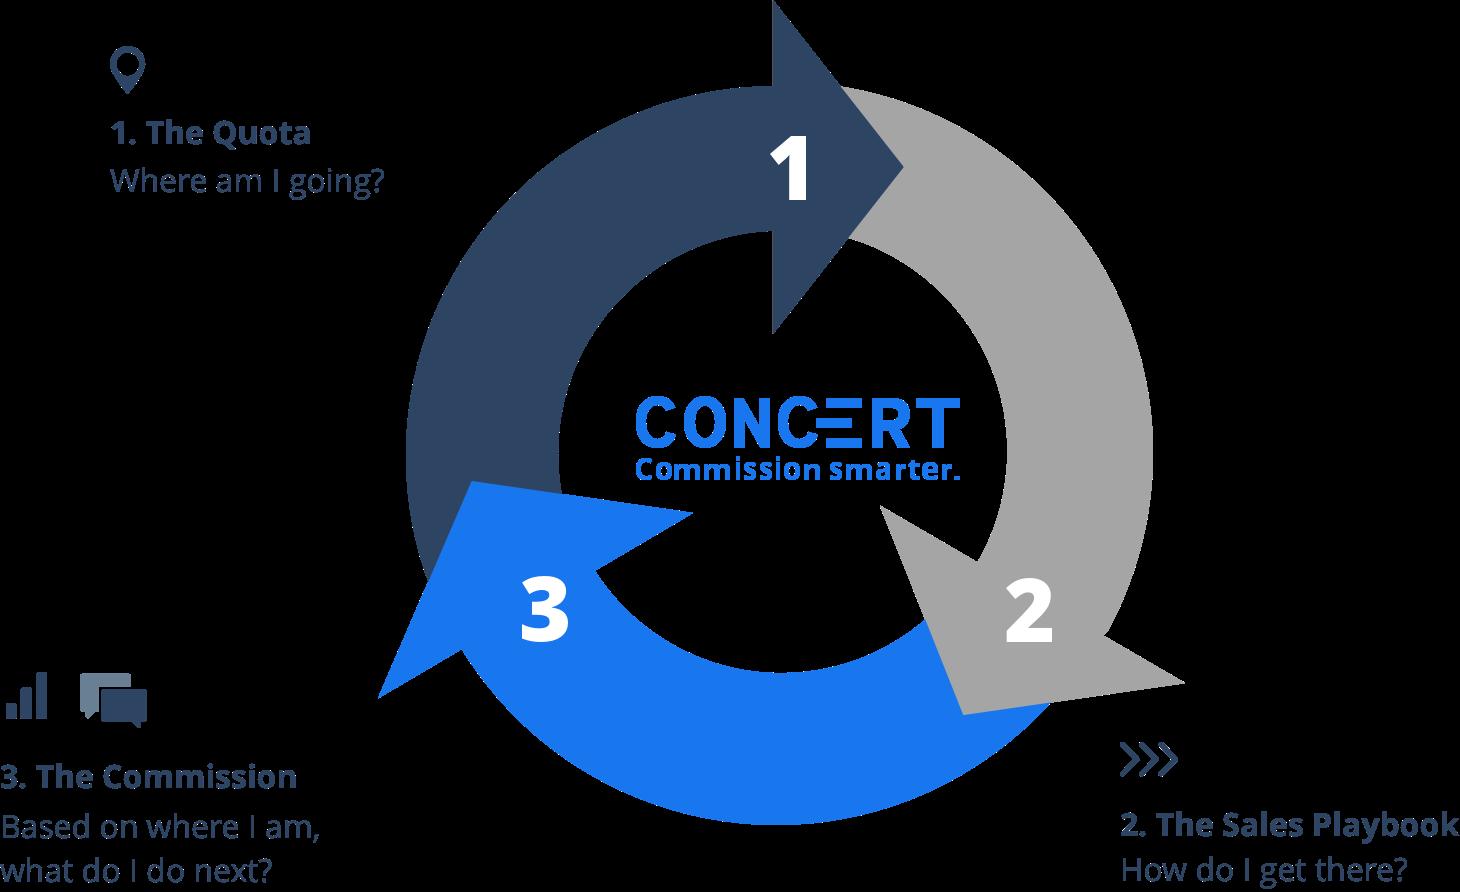 commission-smarter-feedback-loop@2x